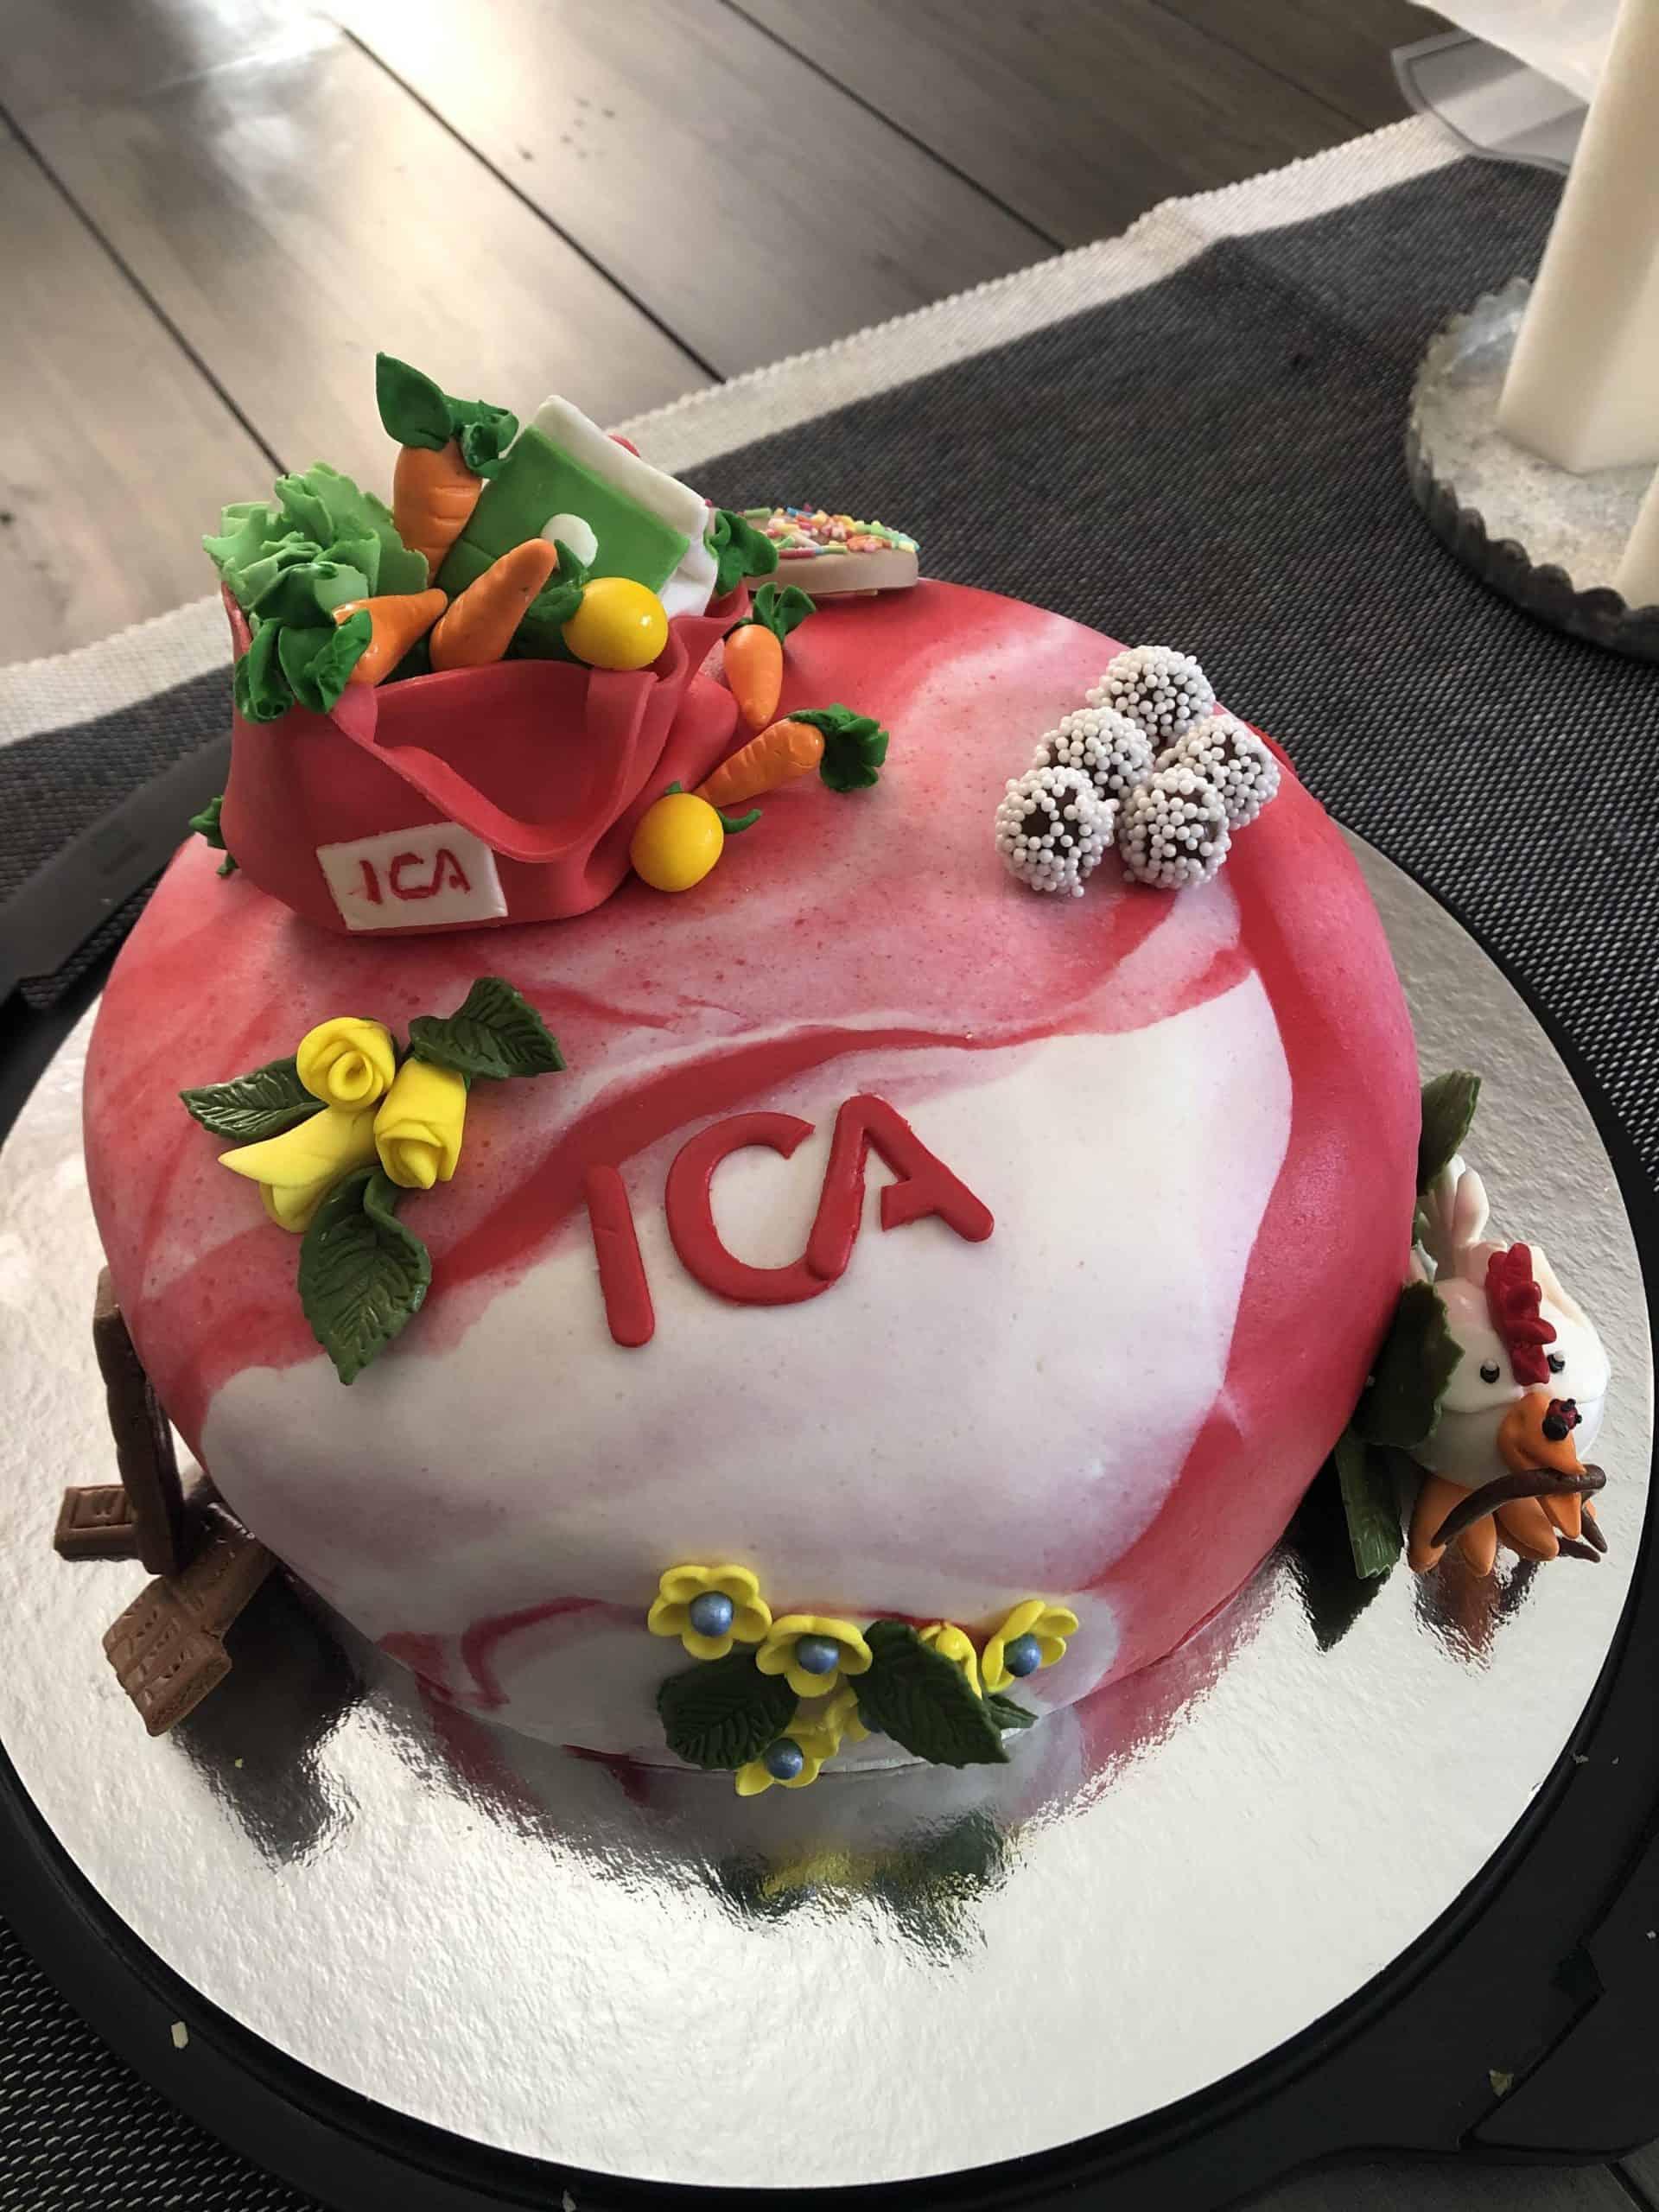 ICA Tårta